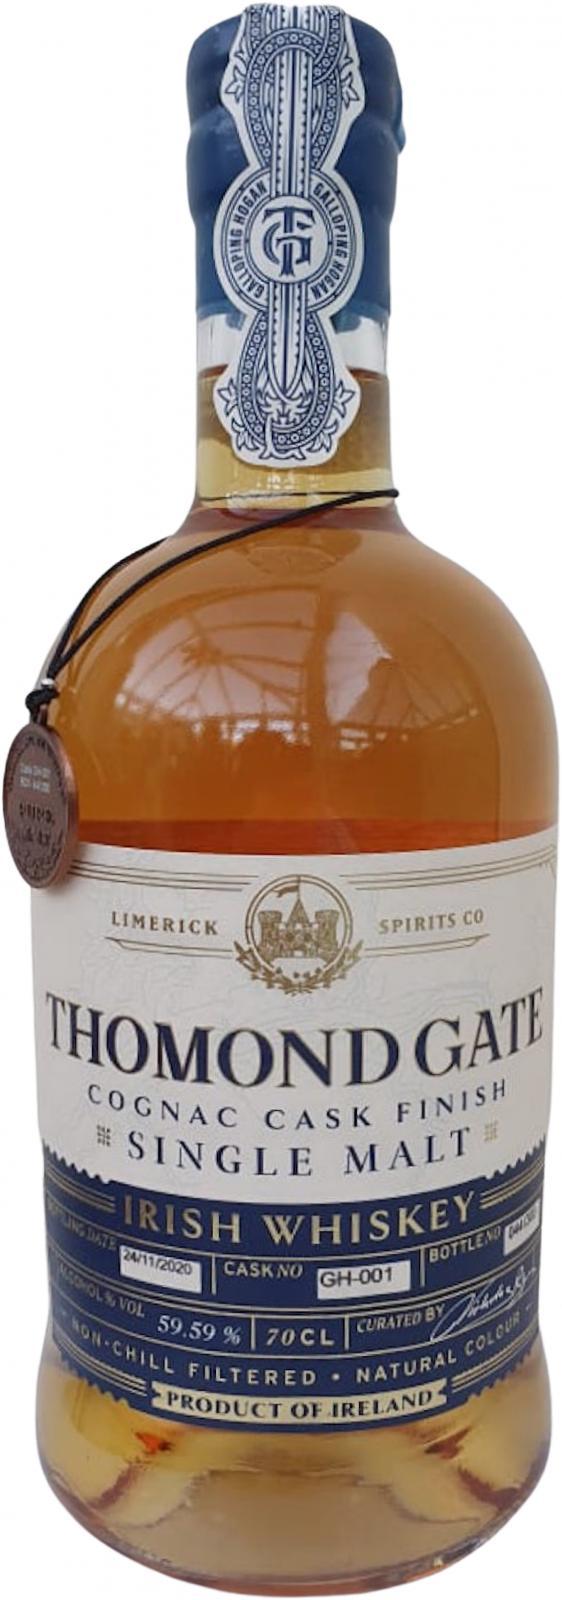 Thomond Gate Galloping Horse Hogan TLS